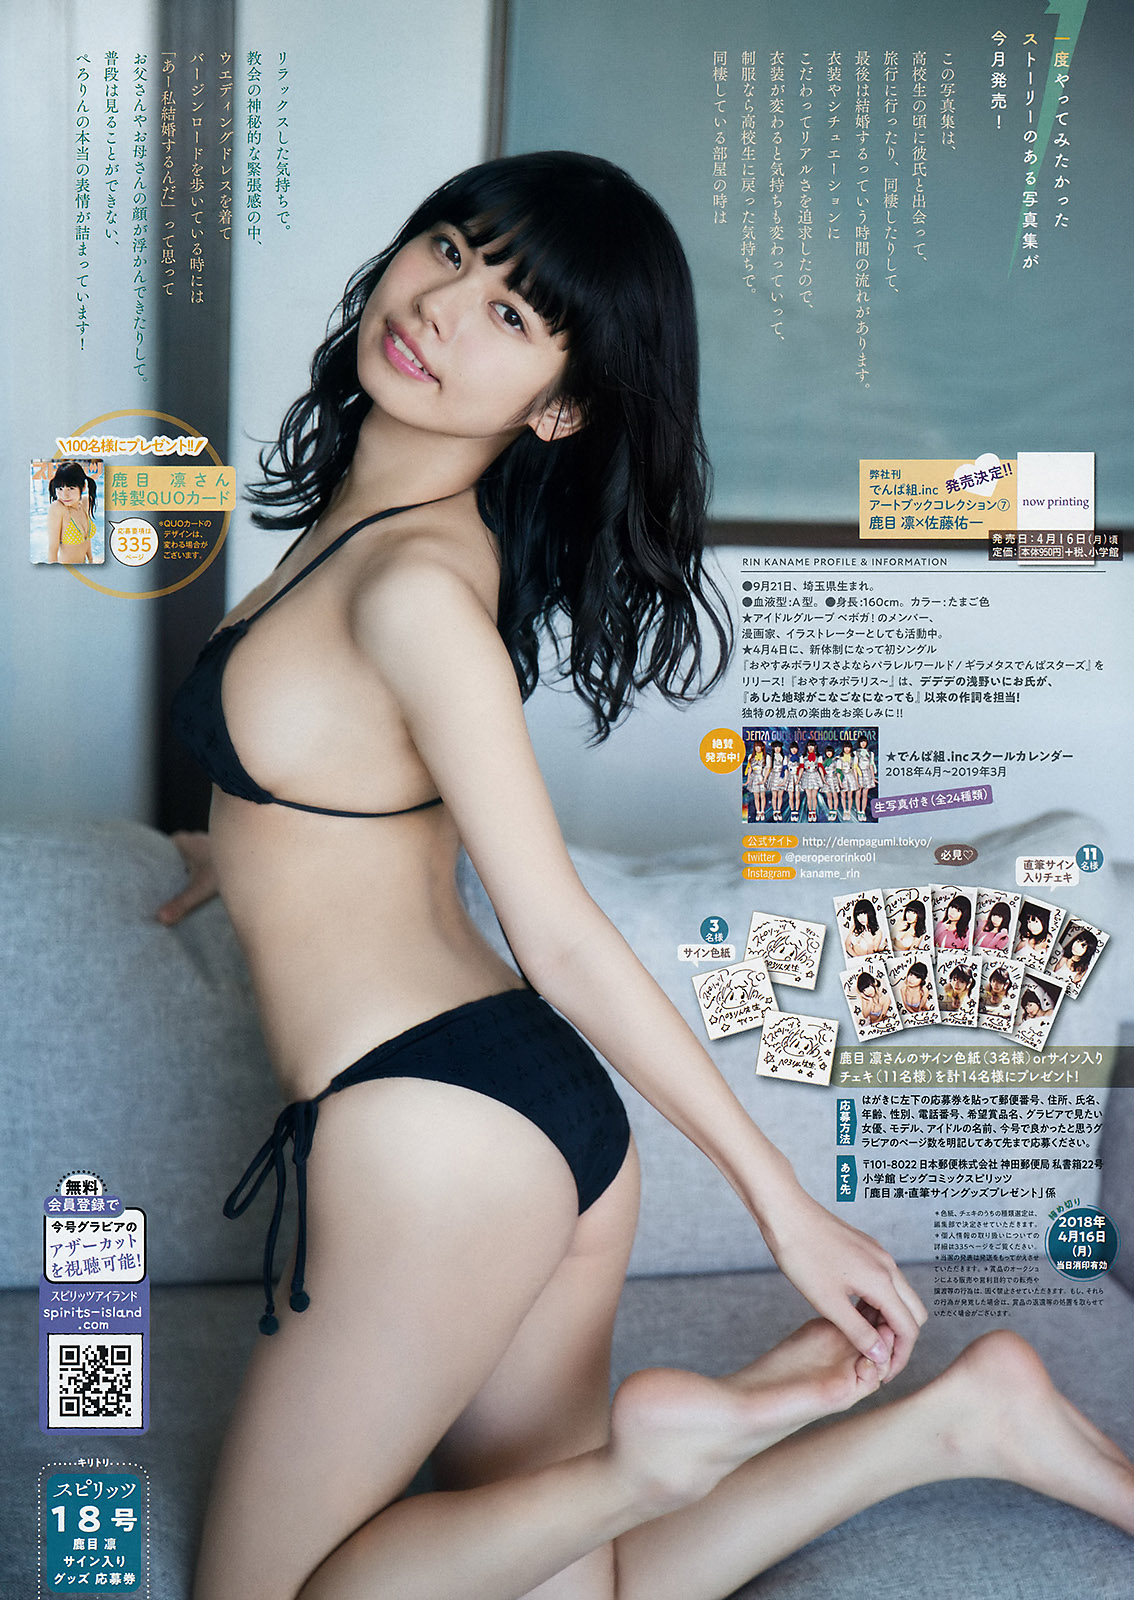 Kaname Rin 鹿目凛, Big Comic Spirits 2018 No.18 (週刊スピリッツ 2018年18号) Dempagumi.inc